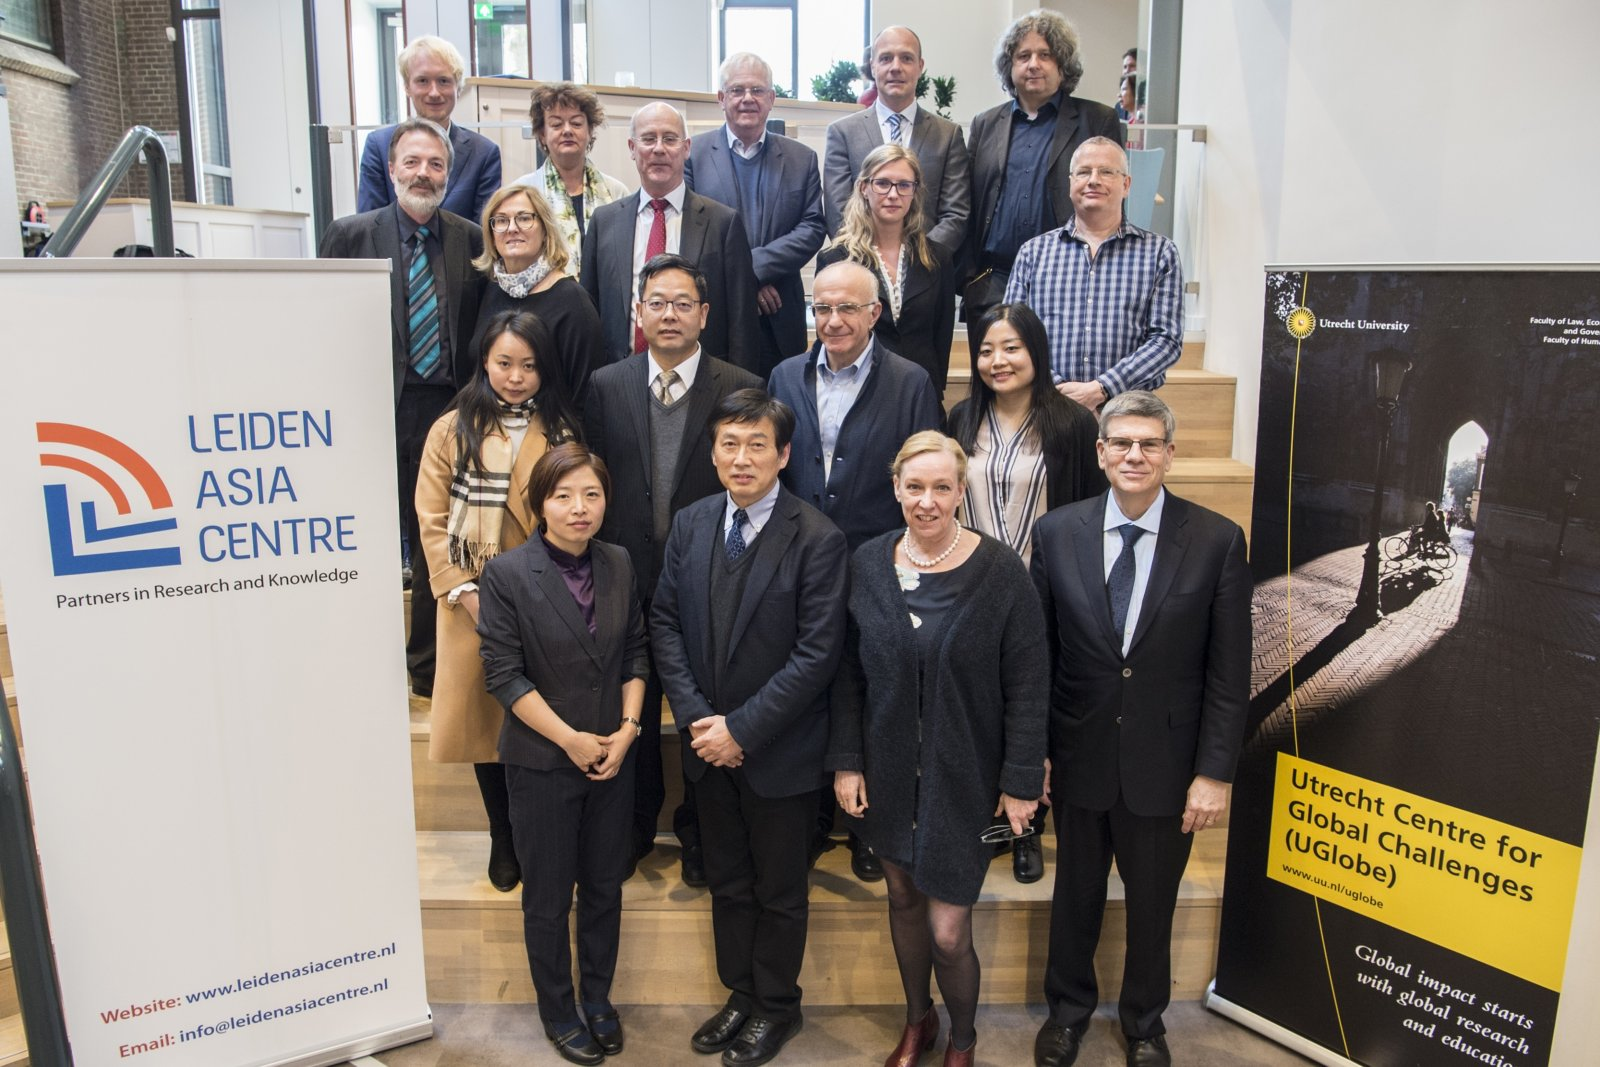 The New Silk Road - UGlobe - Research Consortium